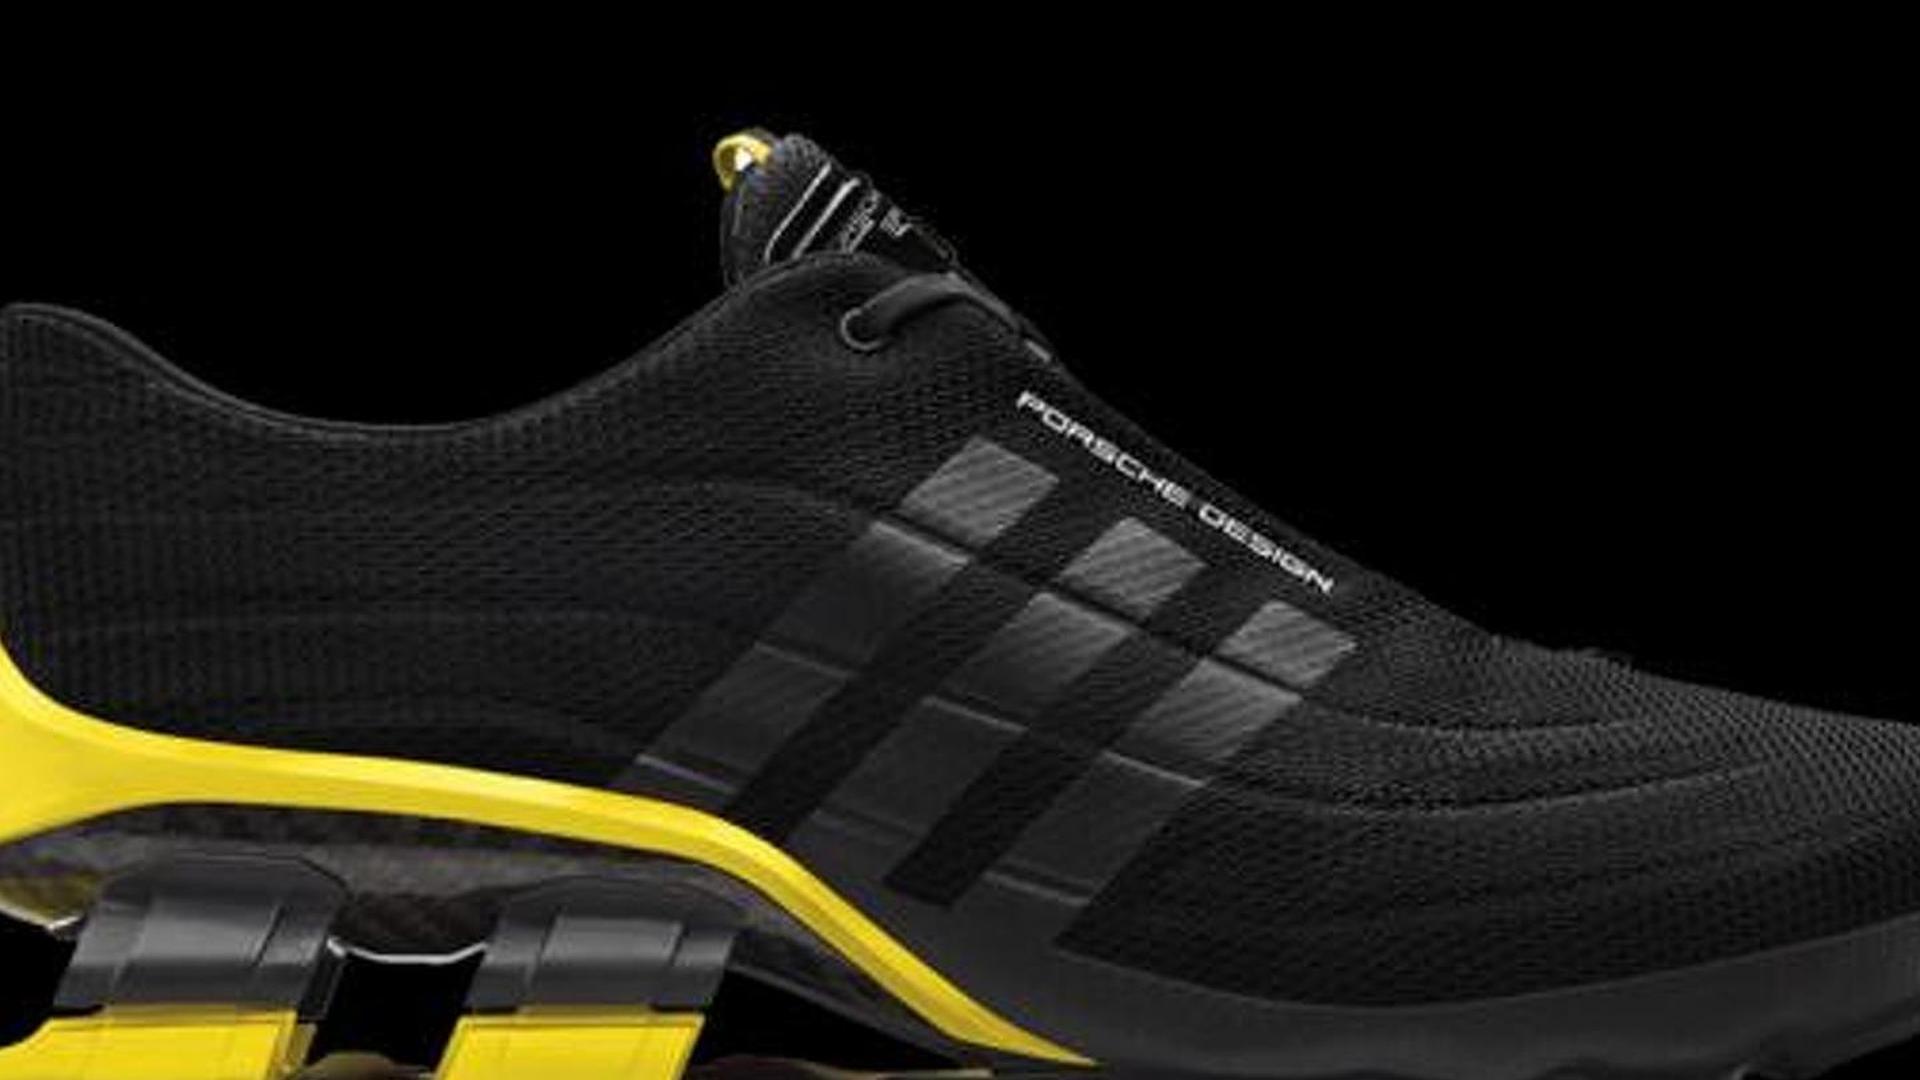 Porsche introduces their $500 running shoes